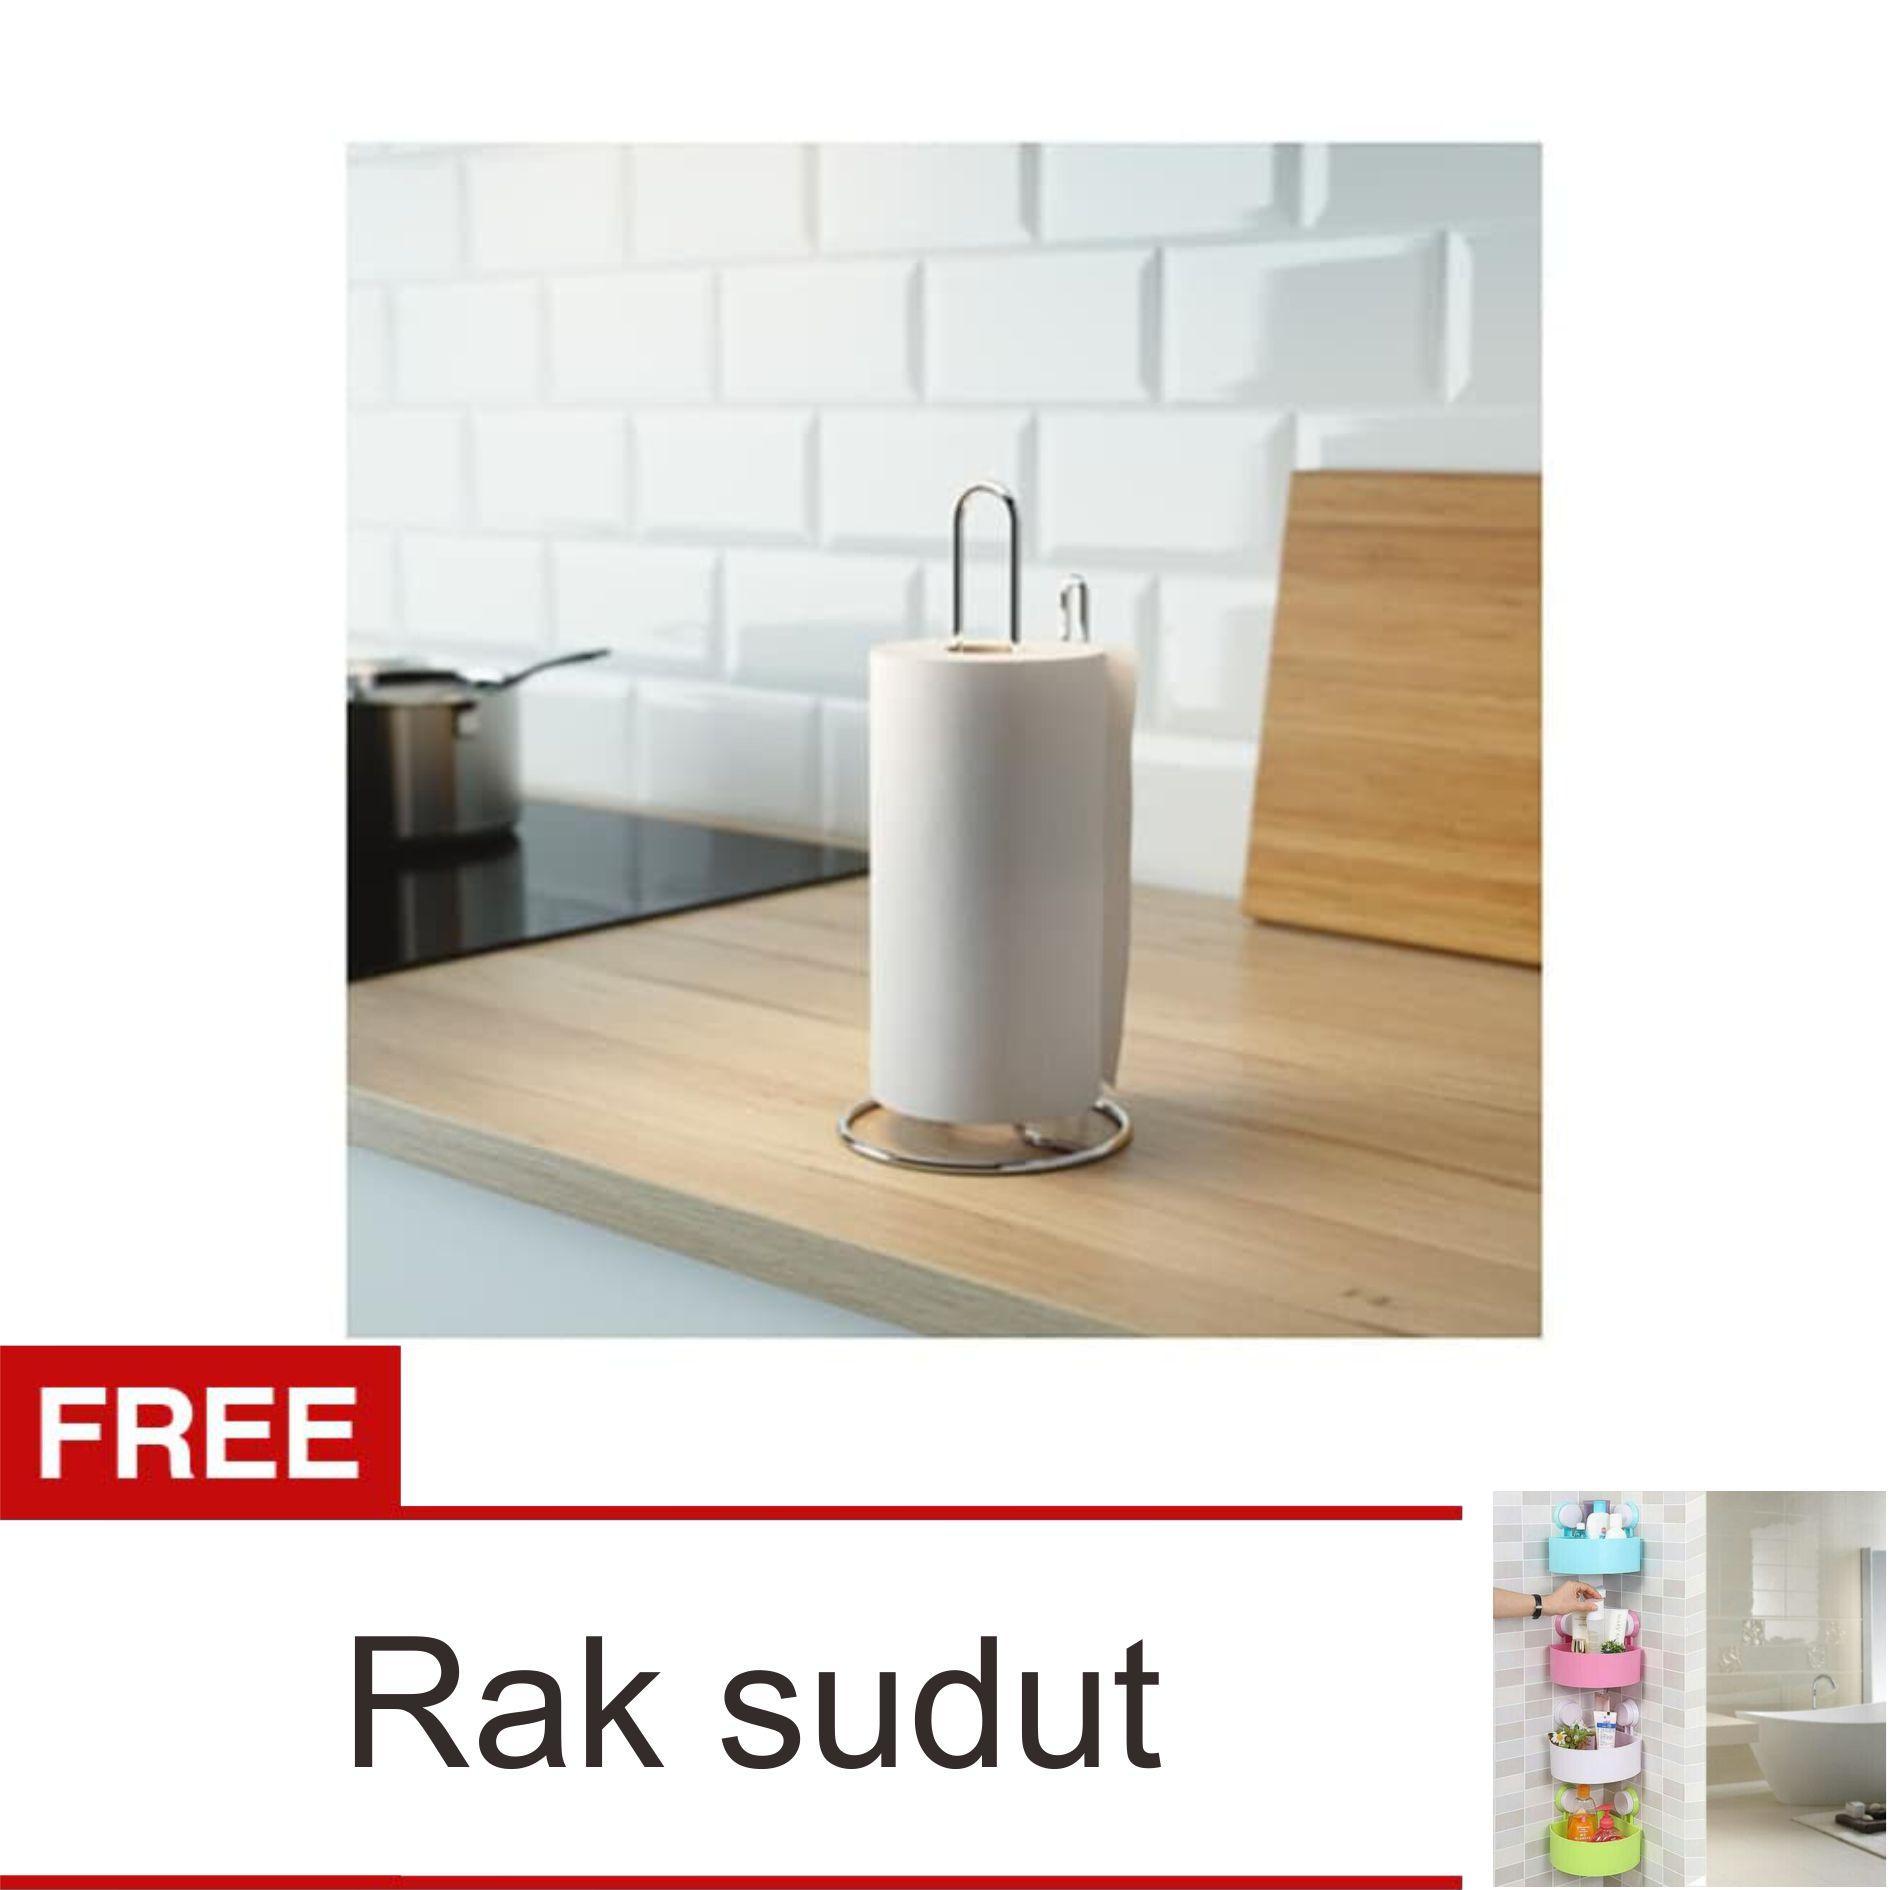 Lanjarjaya Stainless Steel Tempat Tissue Roll Gulung / Torkad Kichen Roll Holder - Silver + Rak